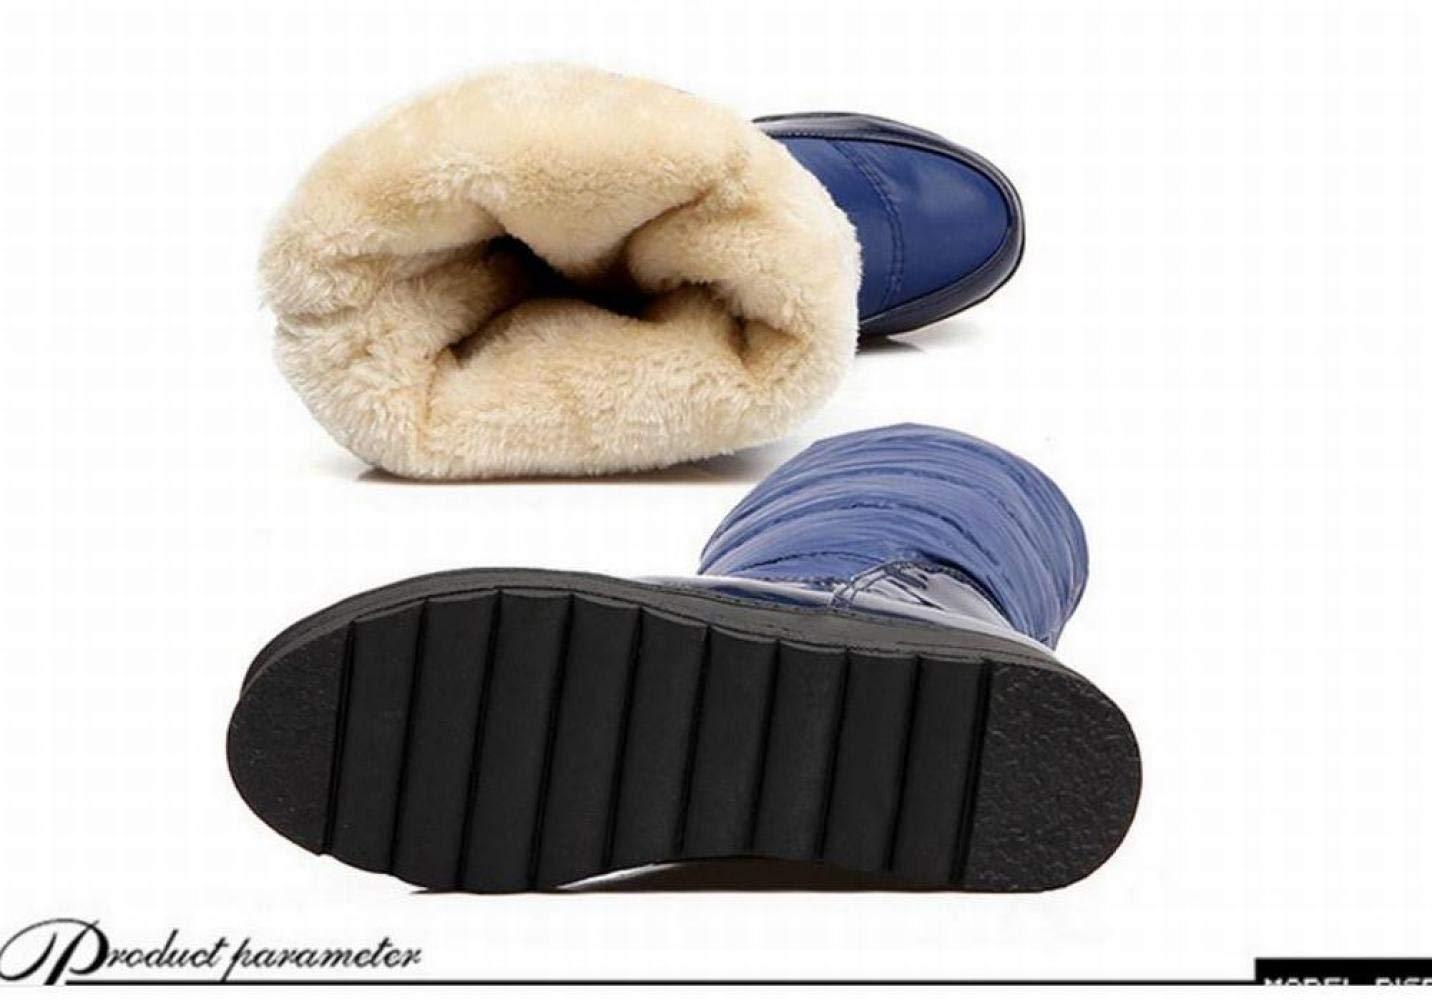 IG Damenstiefel - Winter Warme Warme Warme Anti-Ski-Stiefel Stiefel Erhöhen Ritter Stiefel 34-40 Blau 37 bef5b2